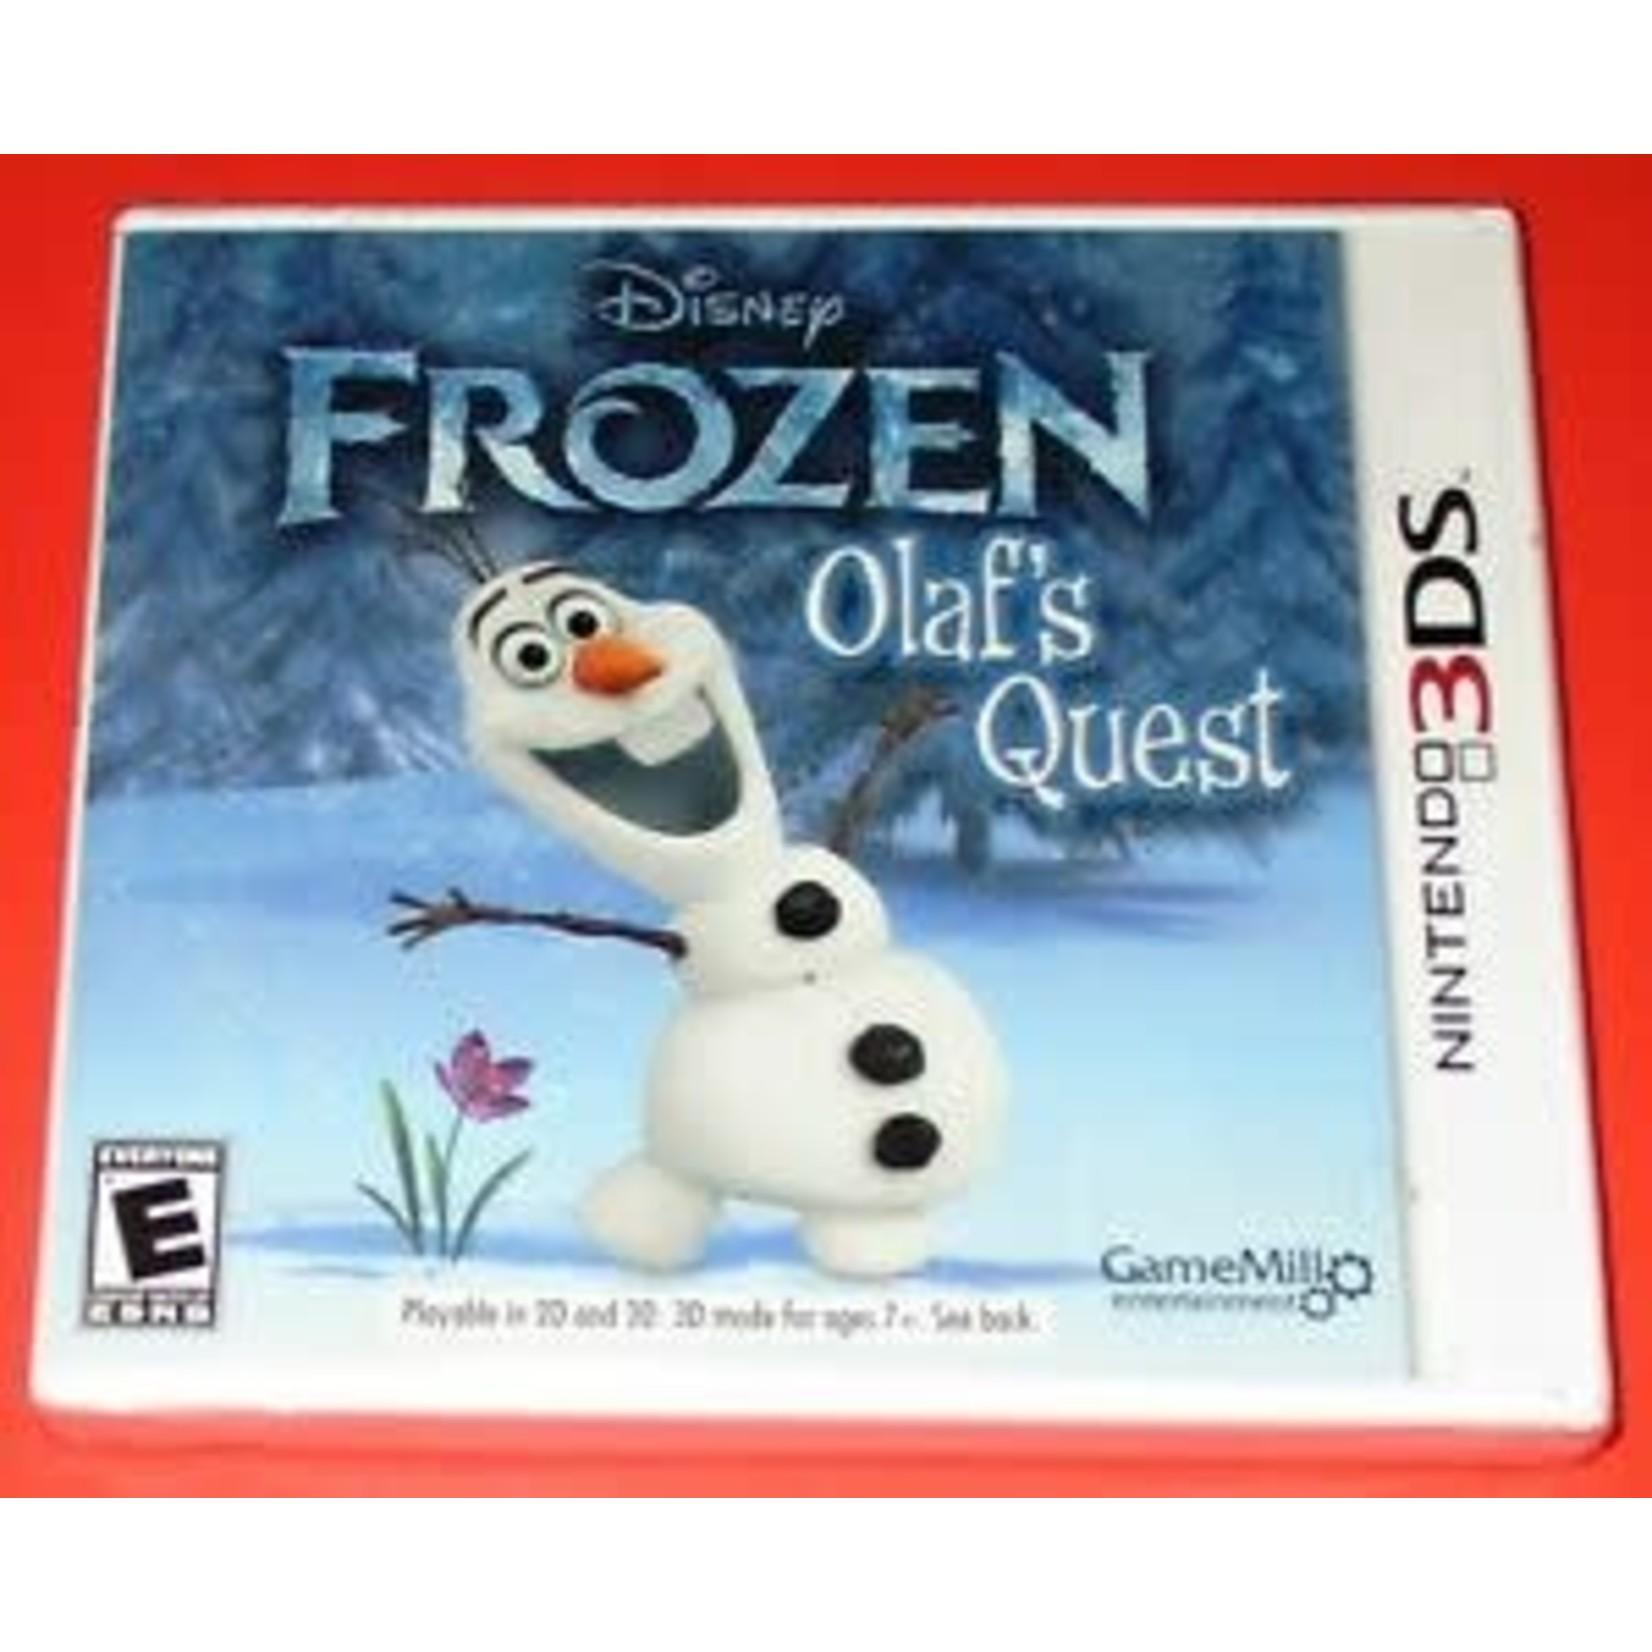 3dsu-Frozen Olaf's Quest